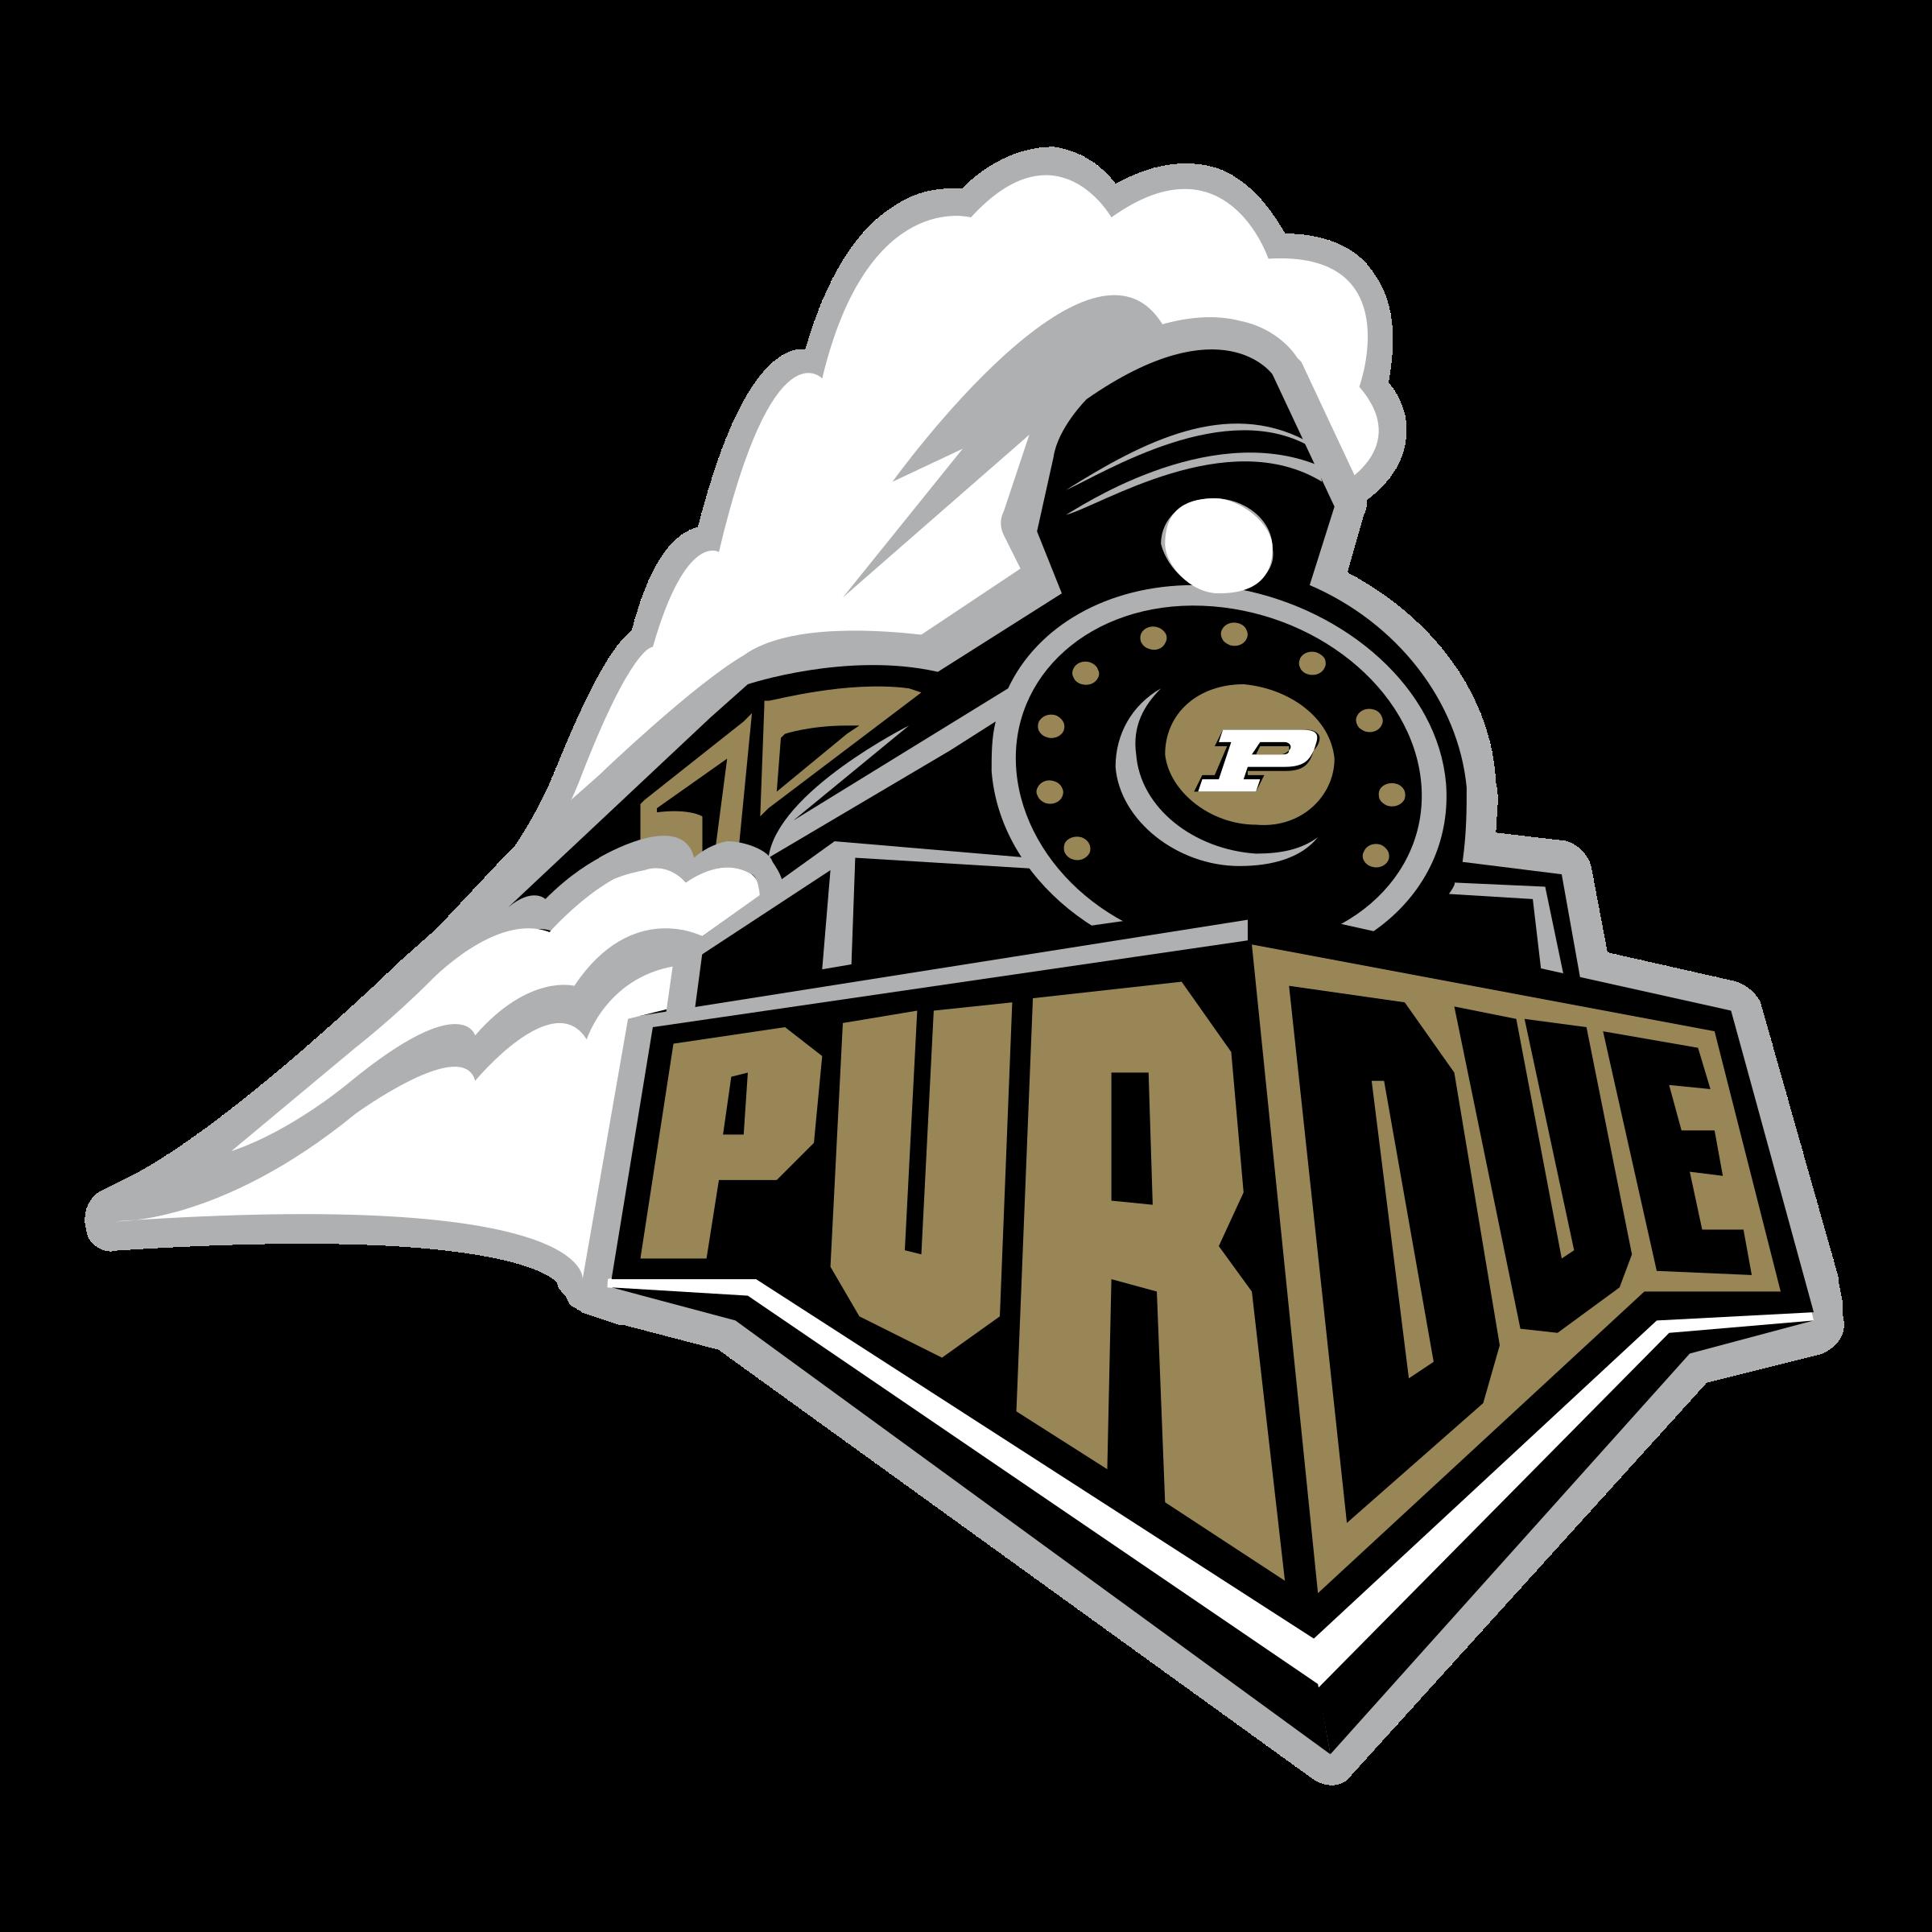 Purdue University BoilerMakers Logo PNG Transparent & SVG